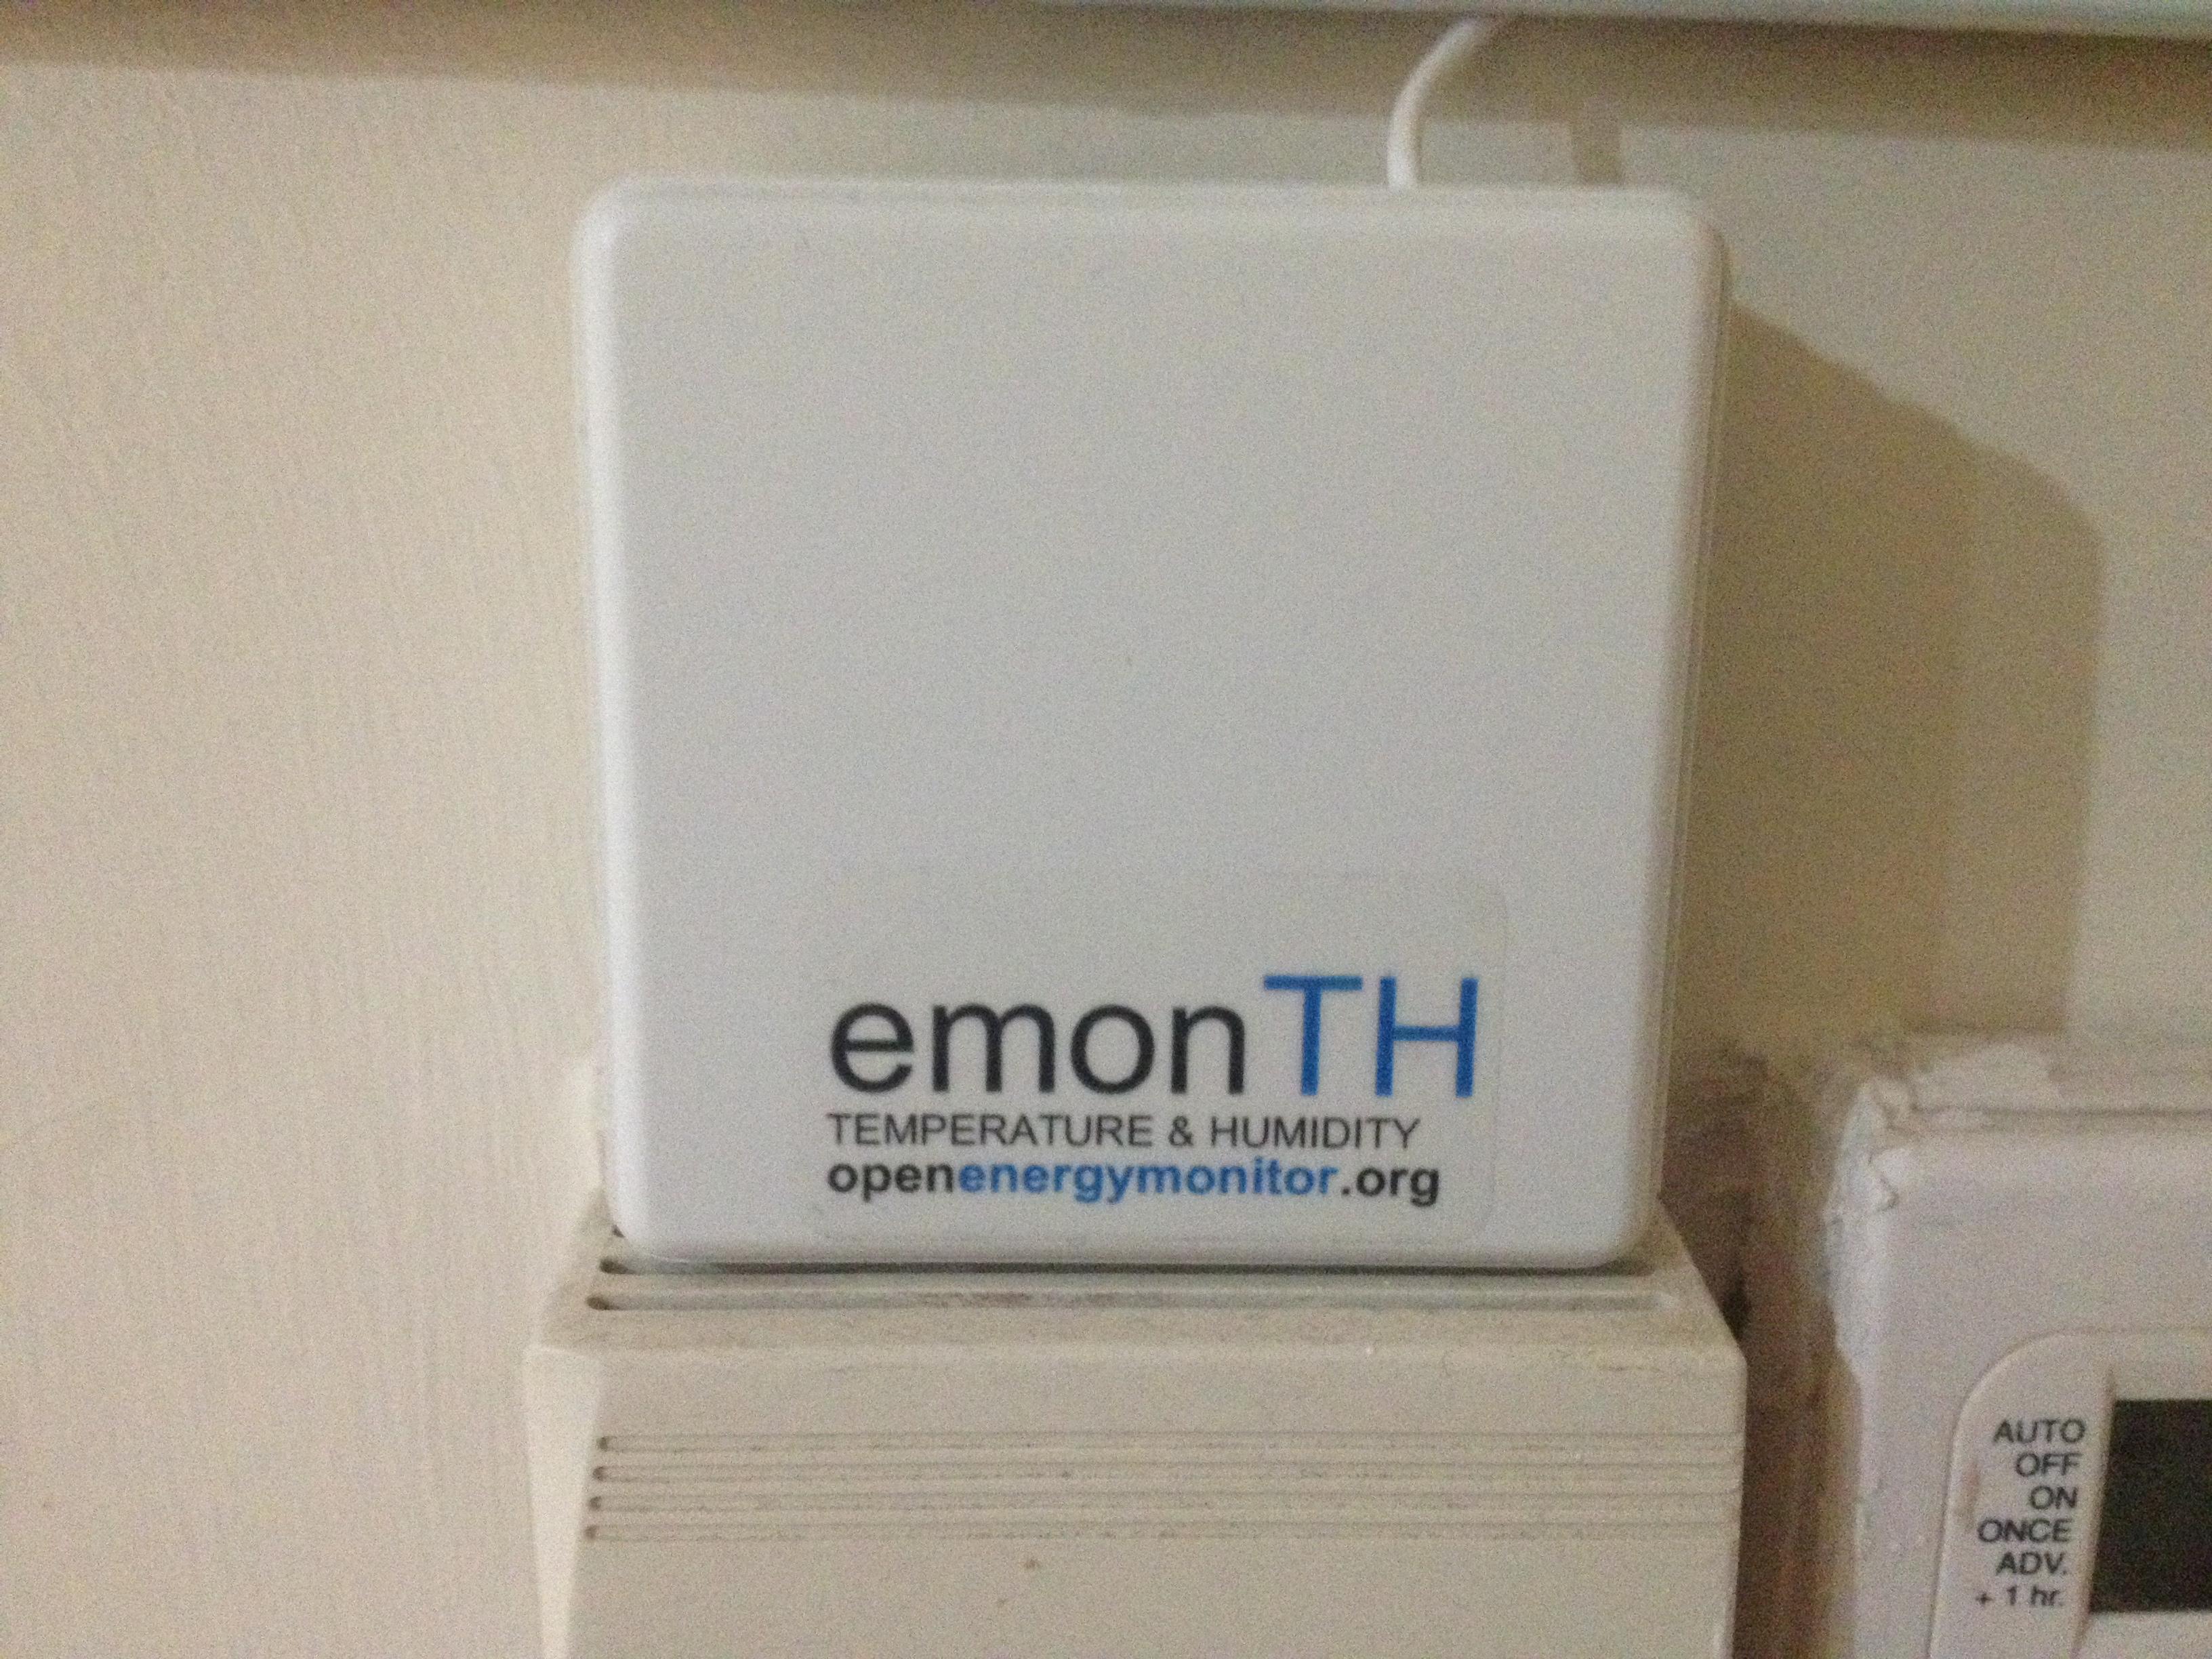 EmonTH - Humidity & Temperature node